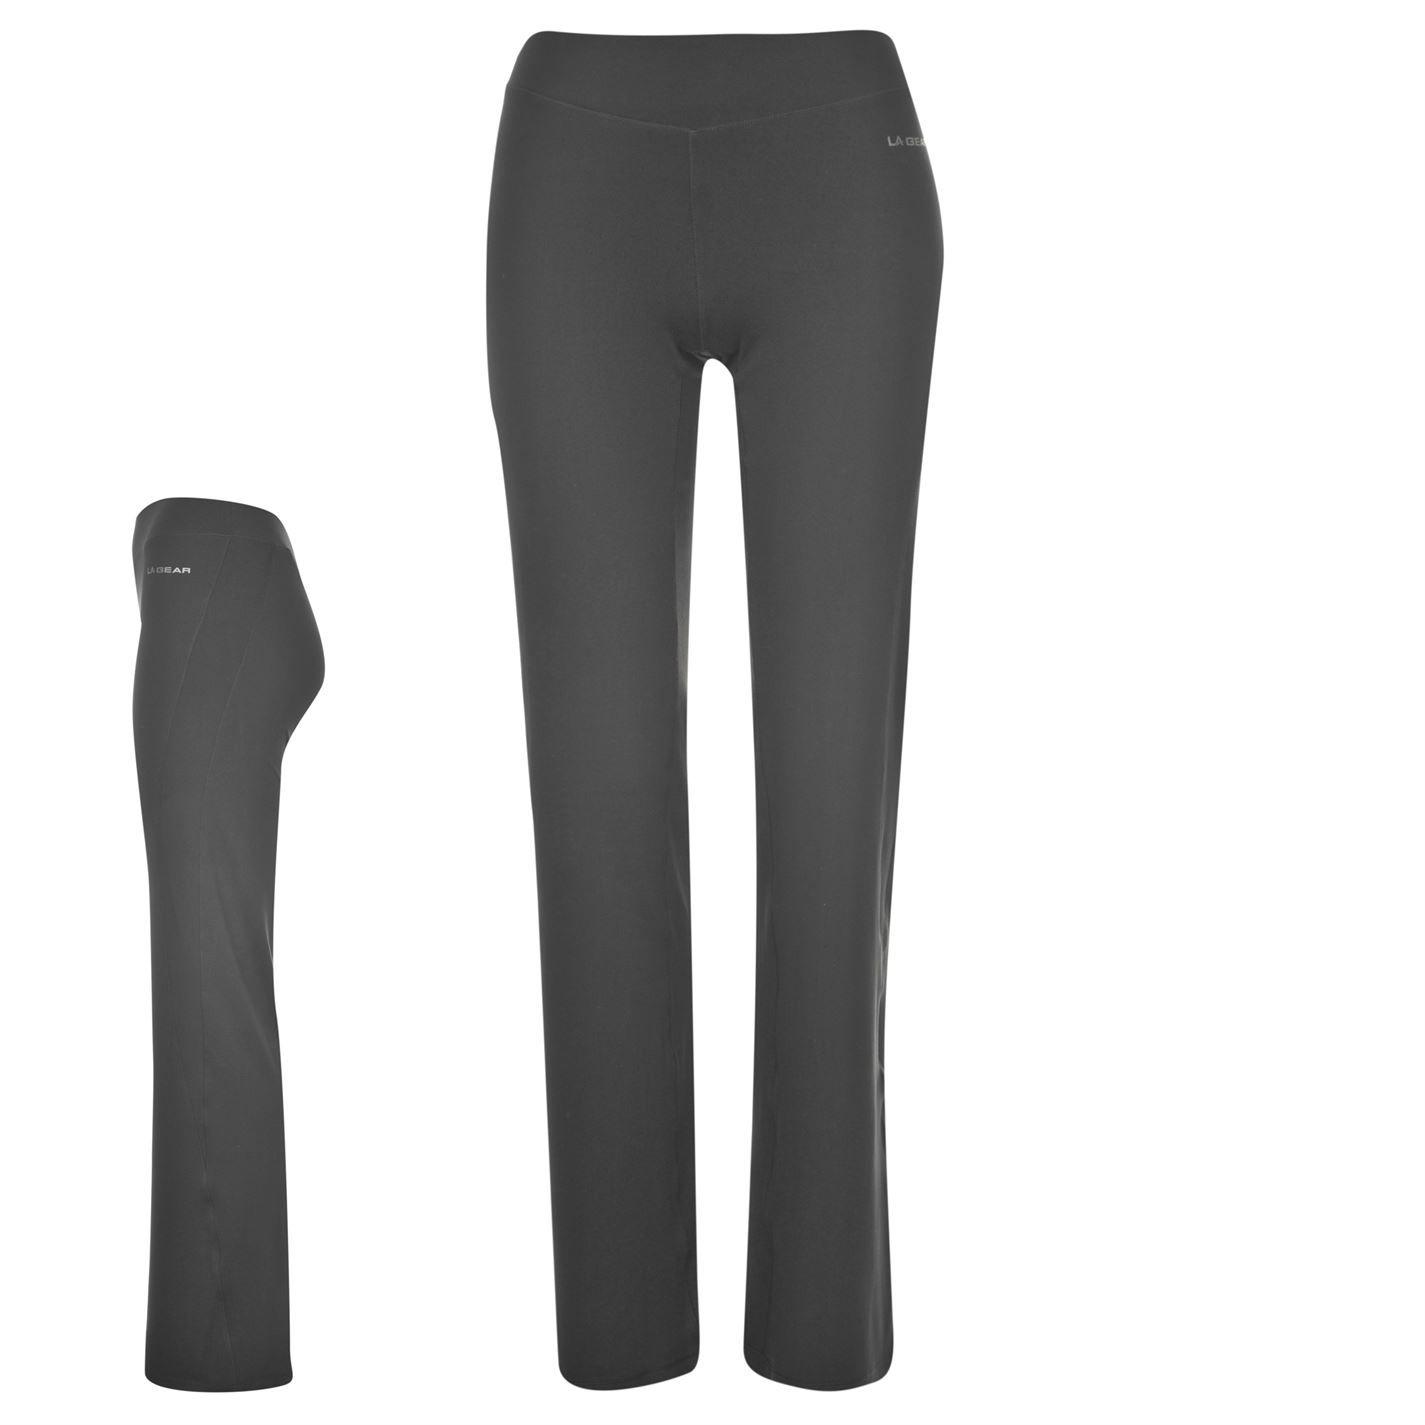 LA Gear three quarter Capri Leggings Ladies Capris Pants Trousers Bottoms